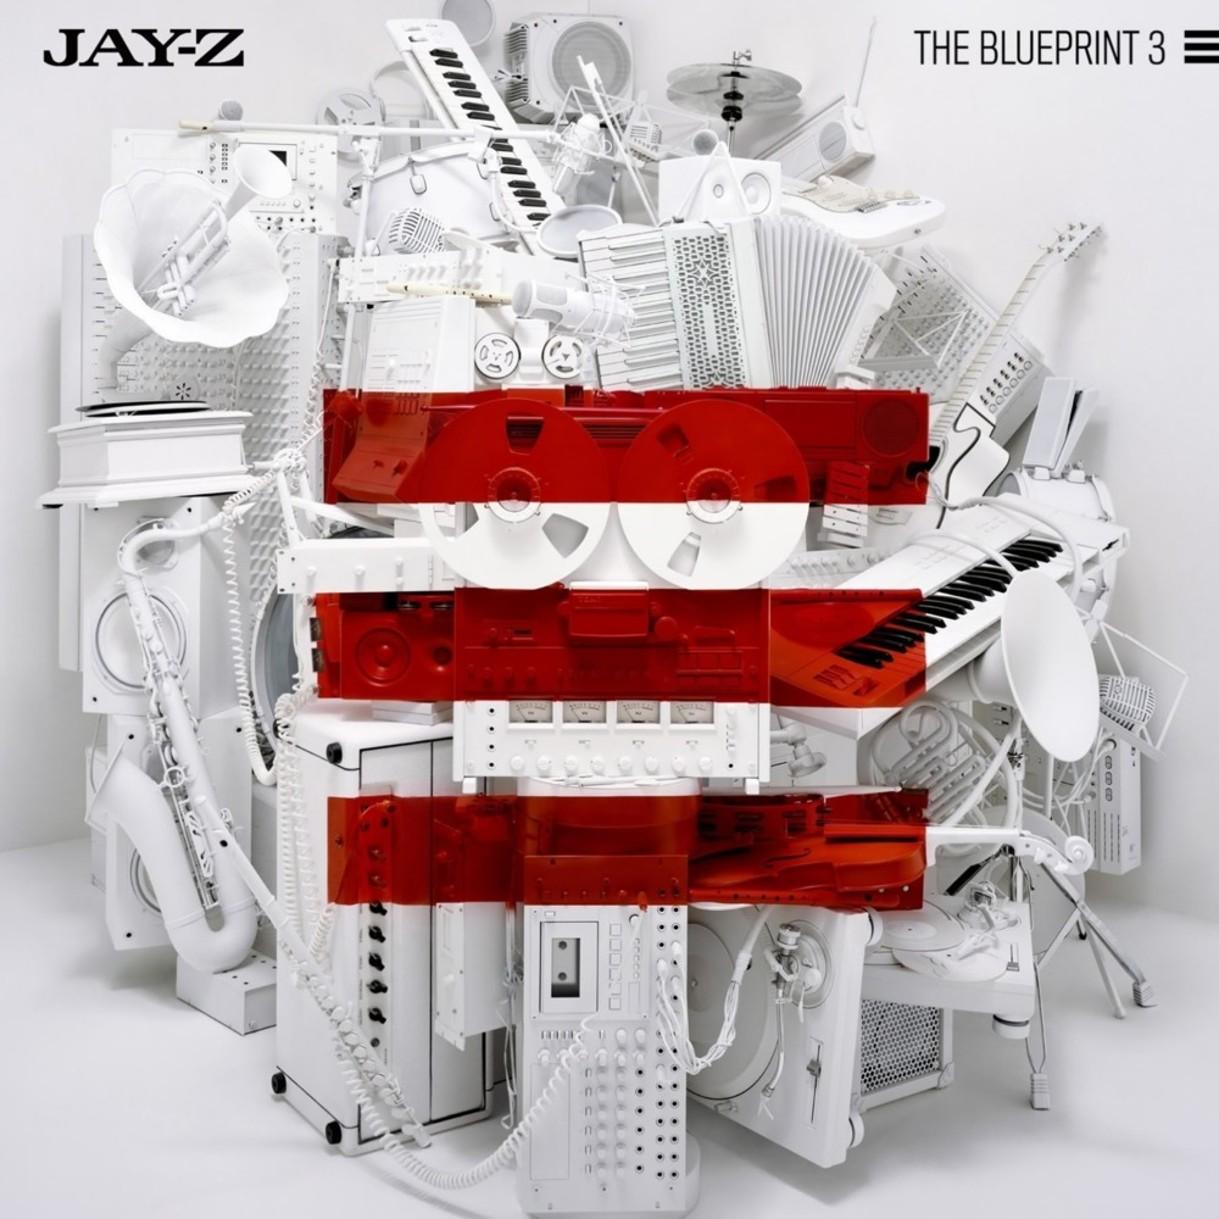 Jay-Z - CD The Blueprint 3